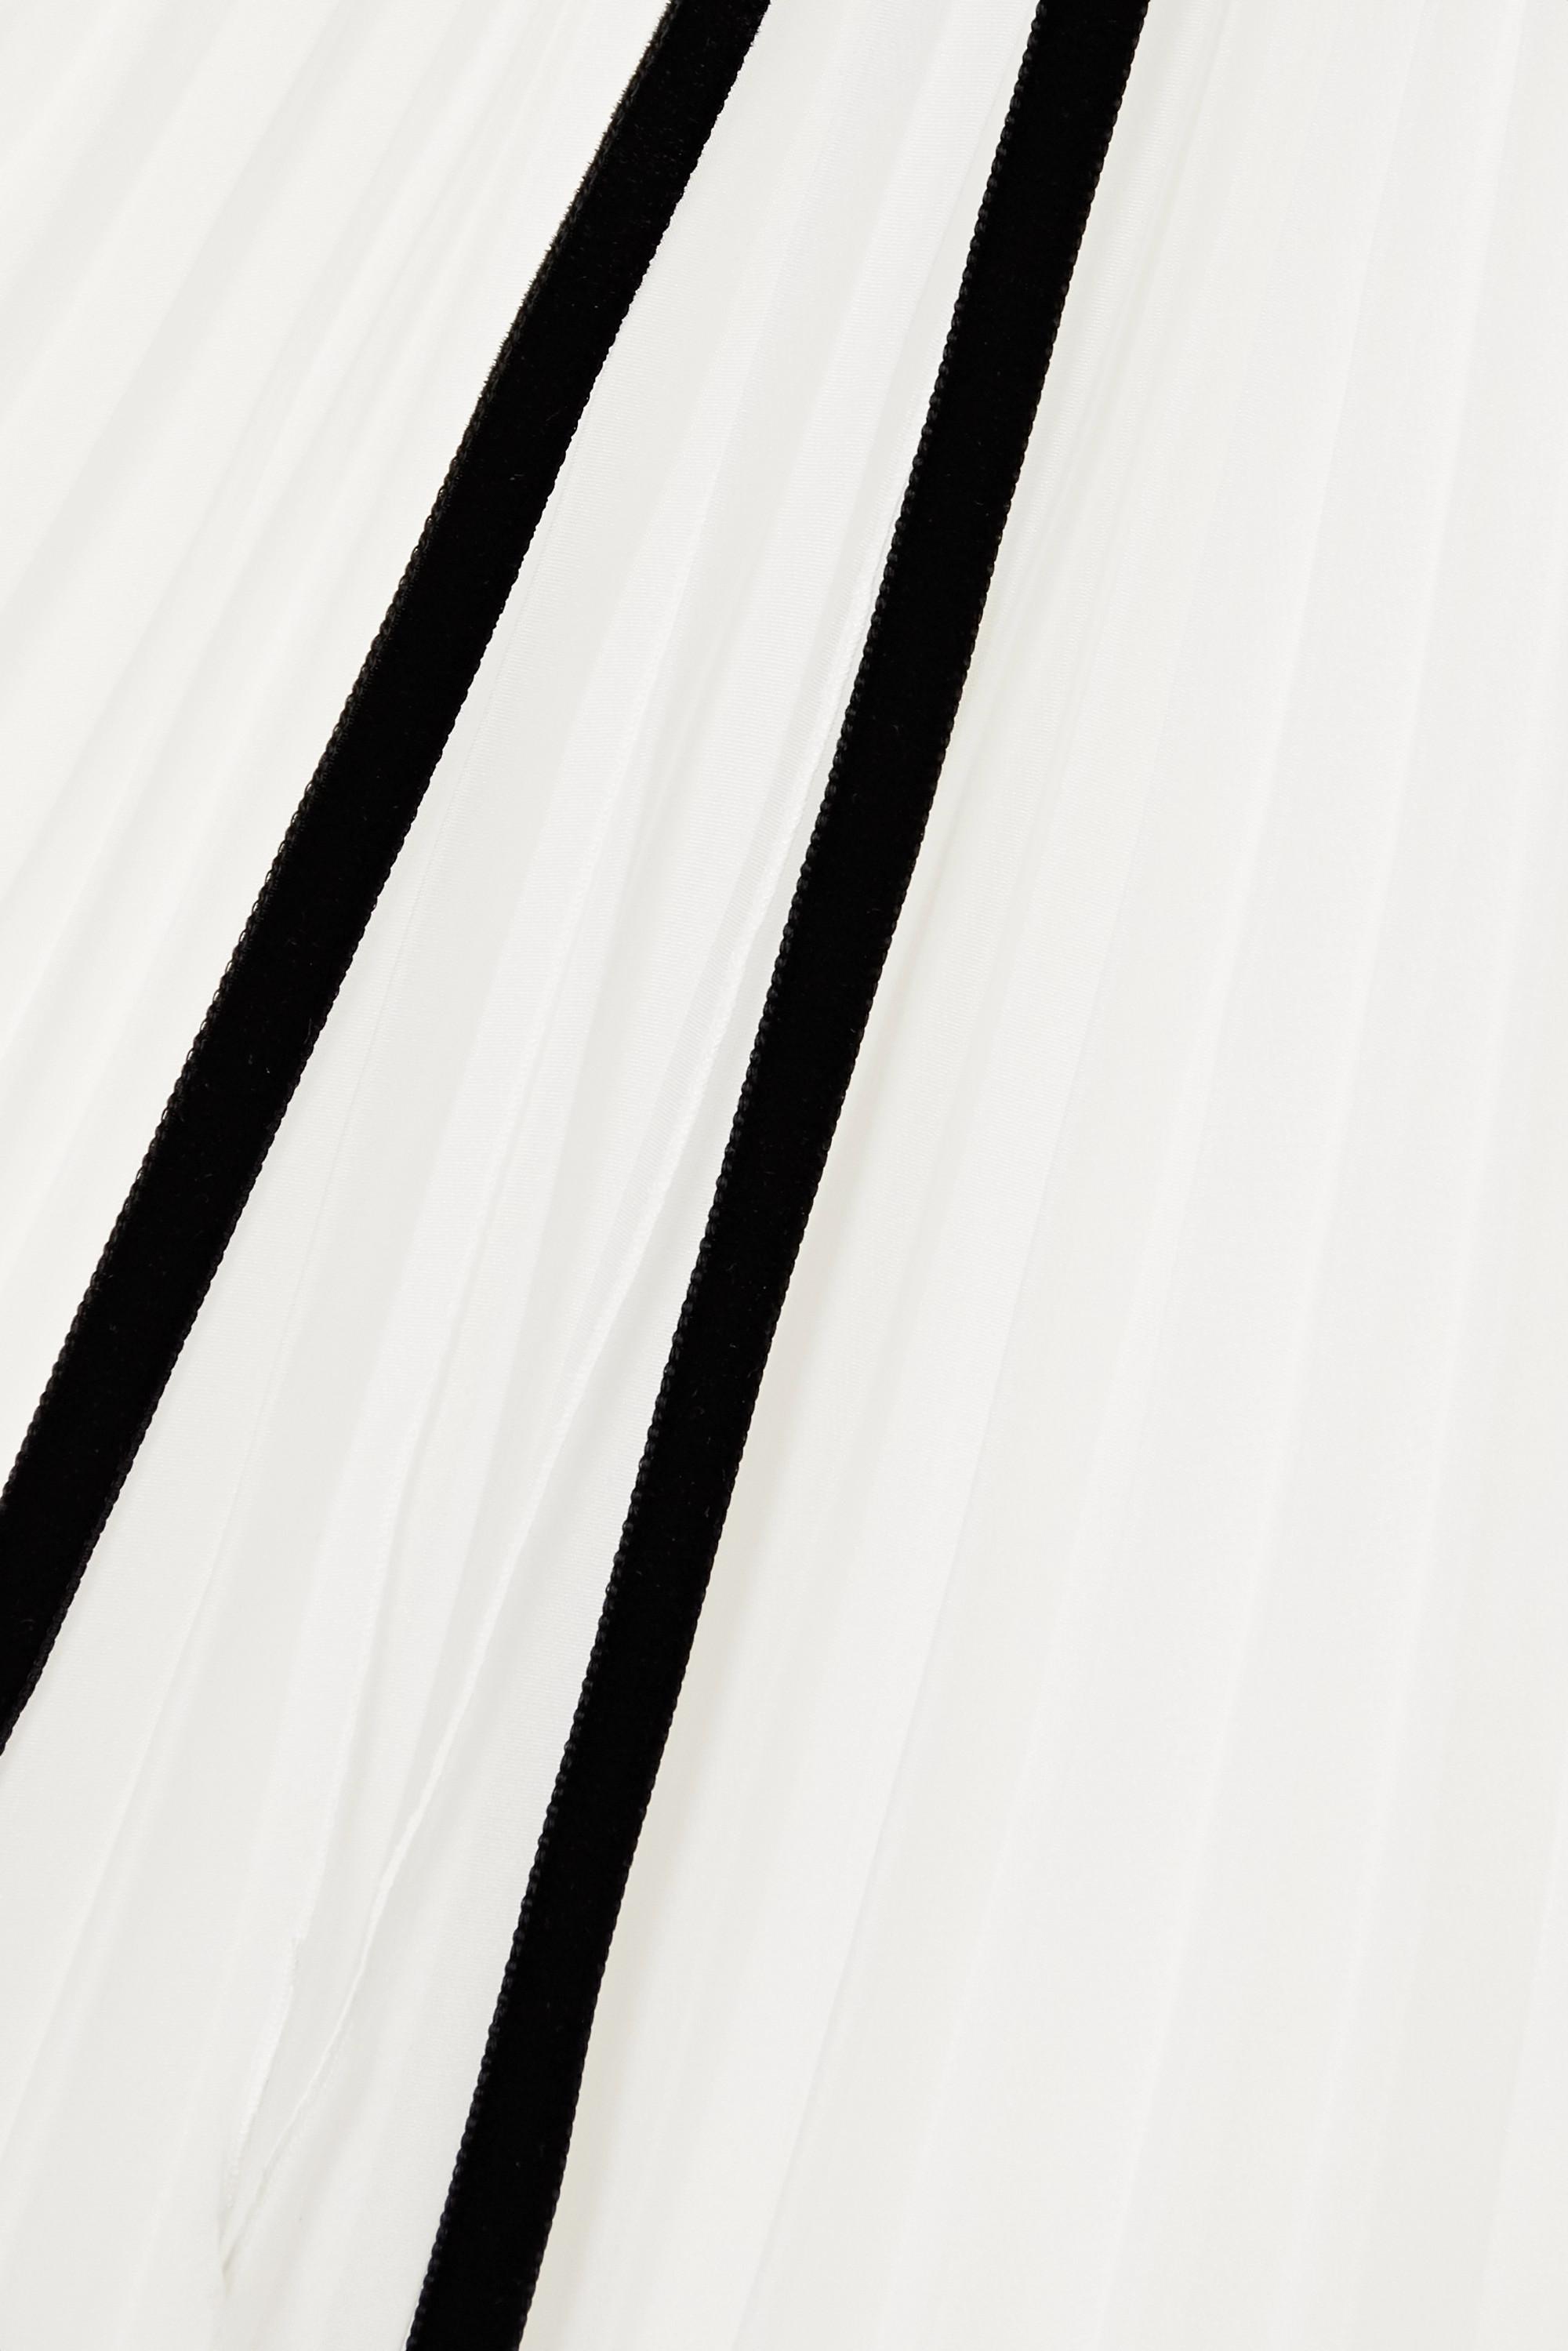 Philosophy di Lorenzo Serafini Bluse aus plissiertem Chiffon zum Binden